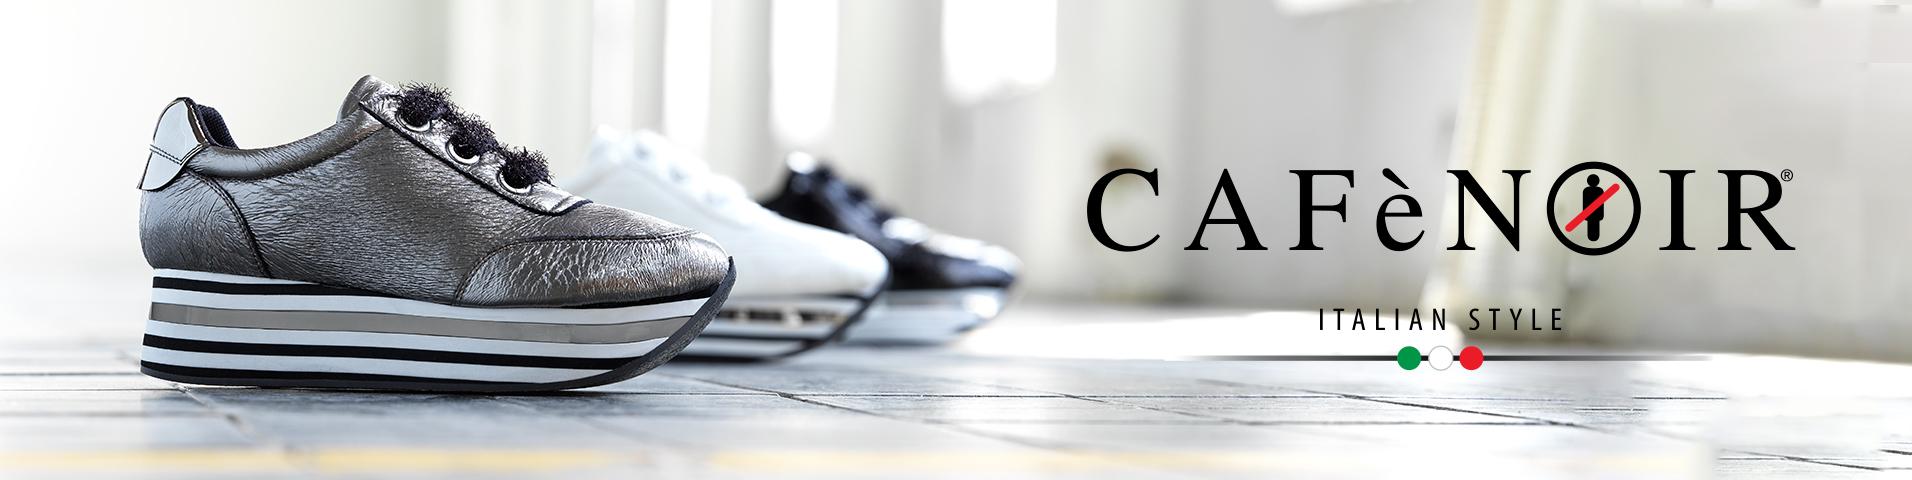 Choix De FemmeGrand Cafènoir Zalando Chaussures Styles mnw8N0